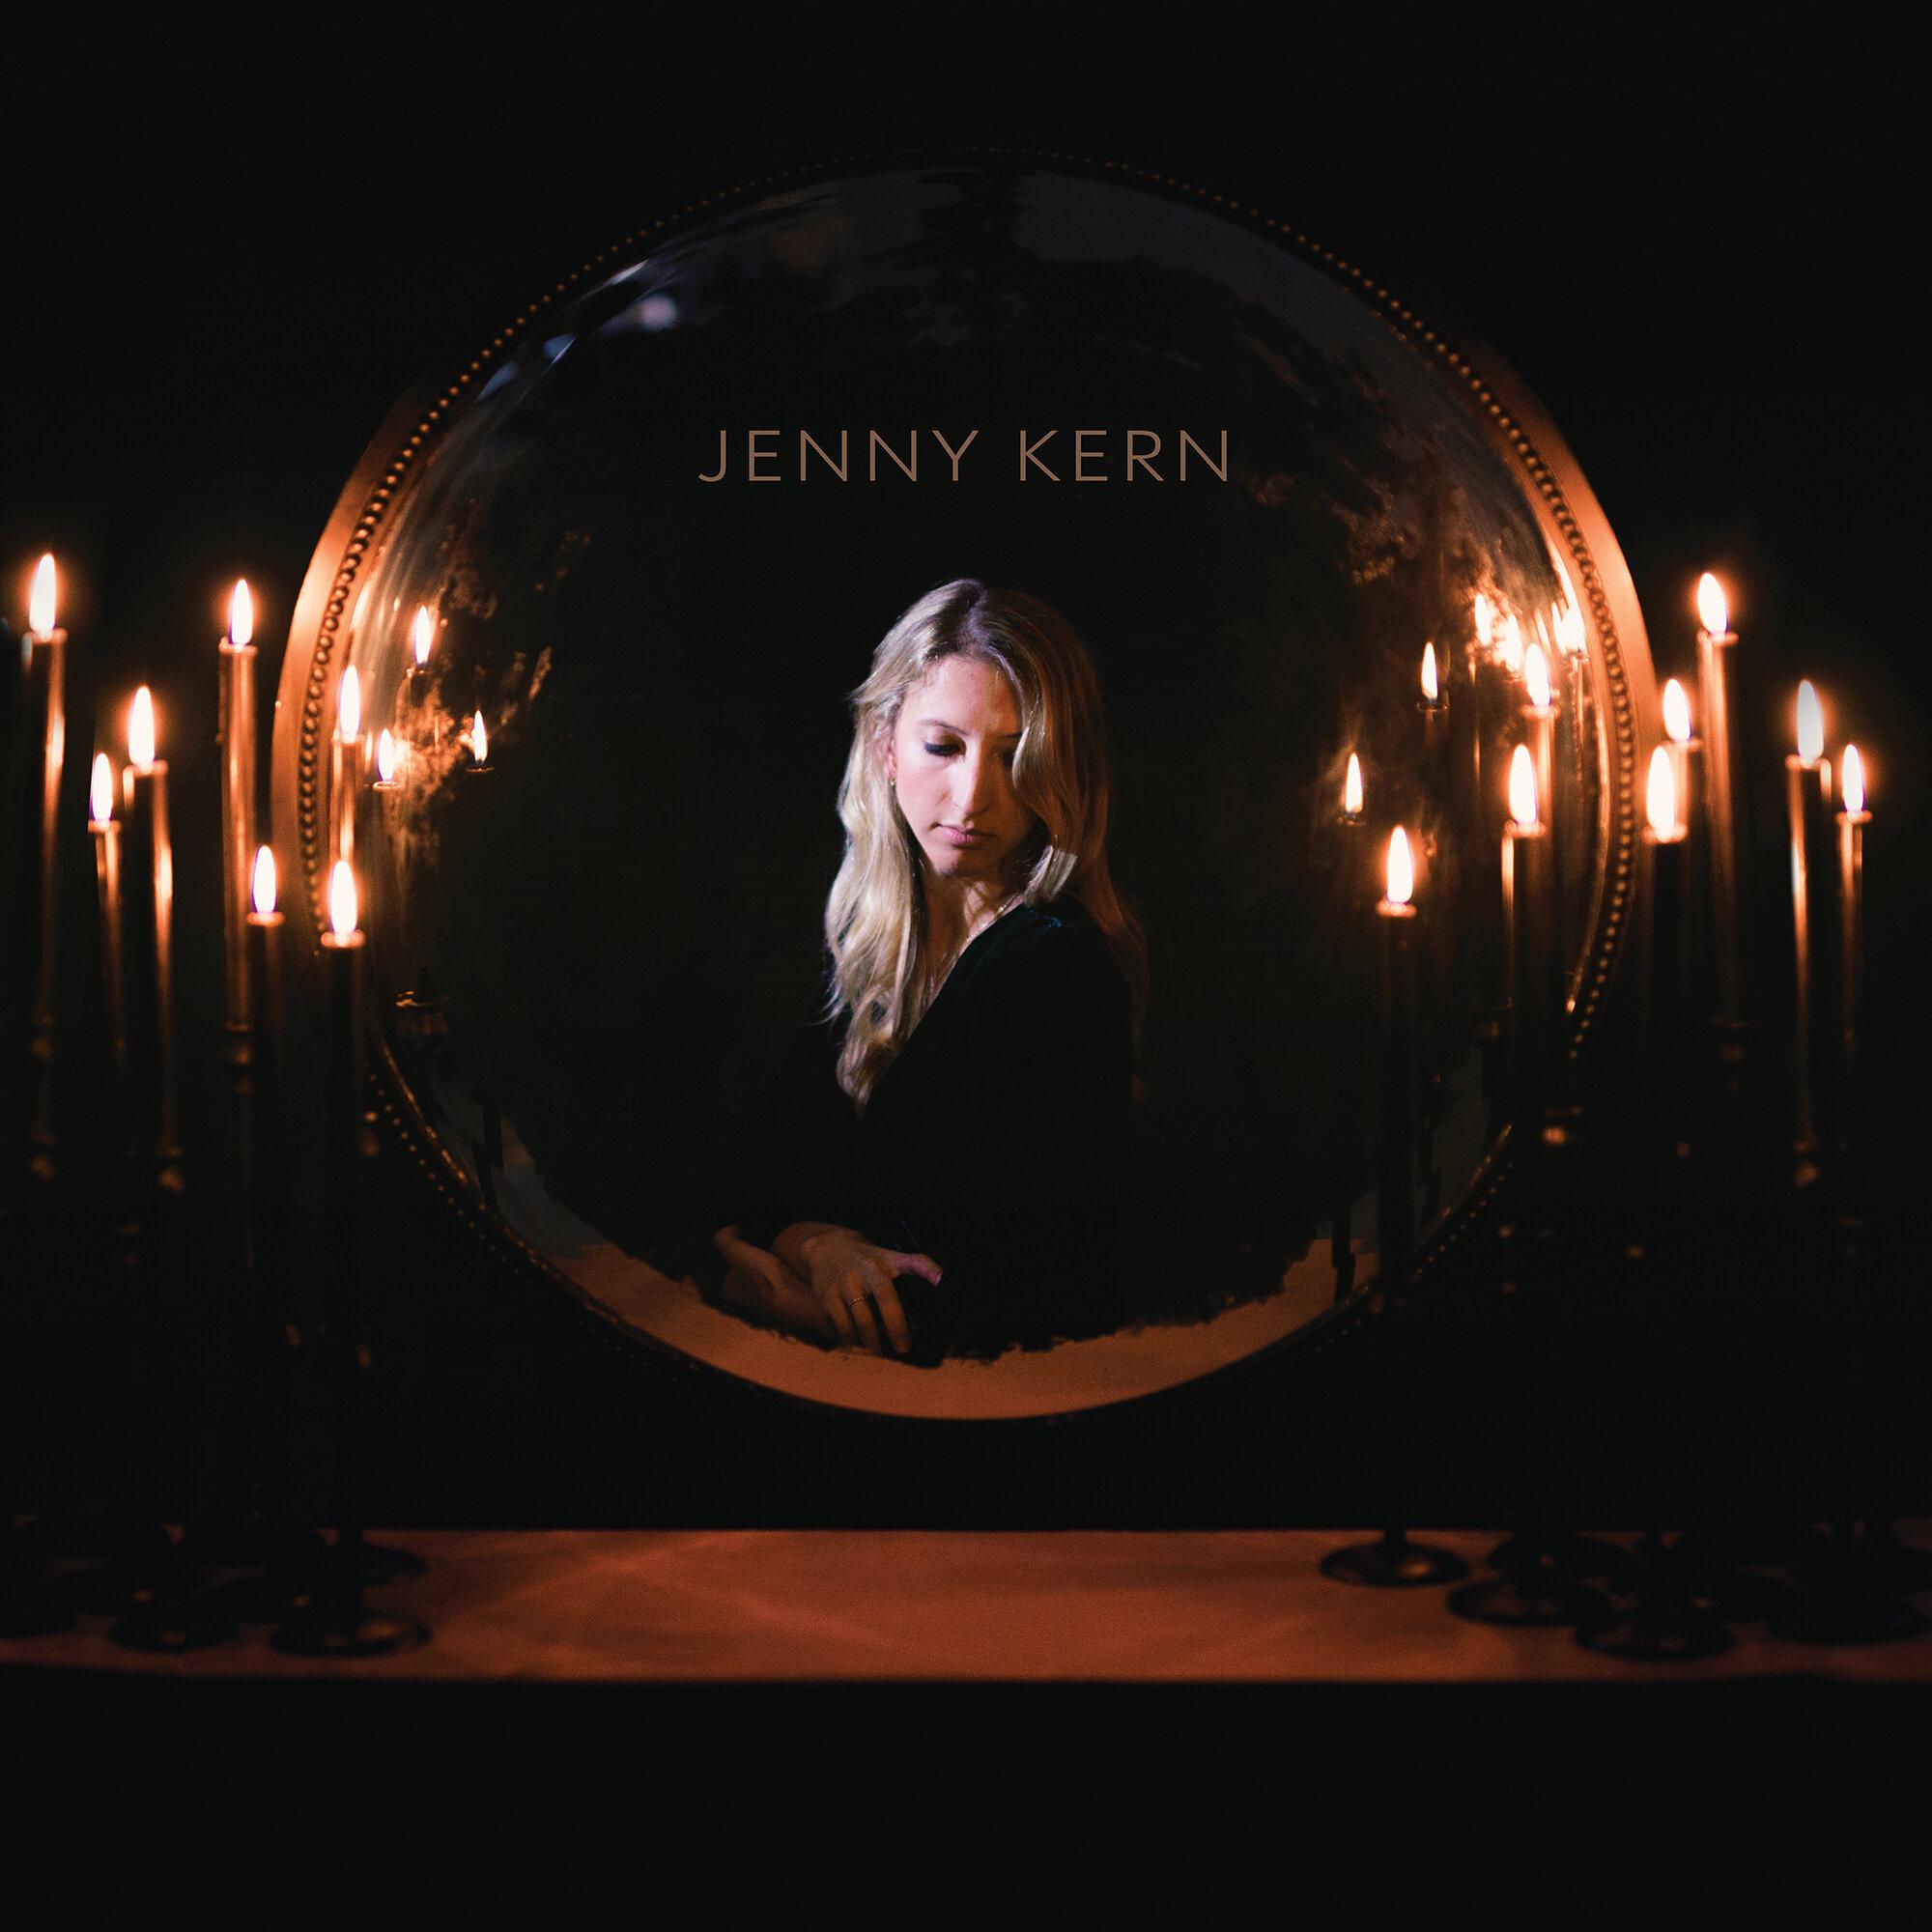 Jenny Kern EP Cover.jpg